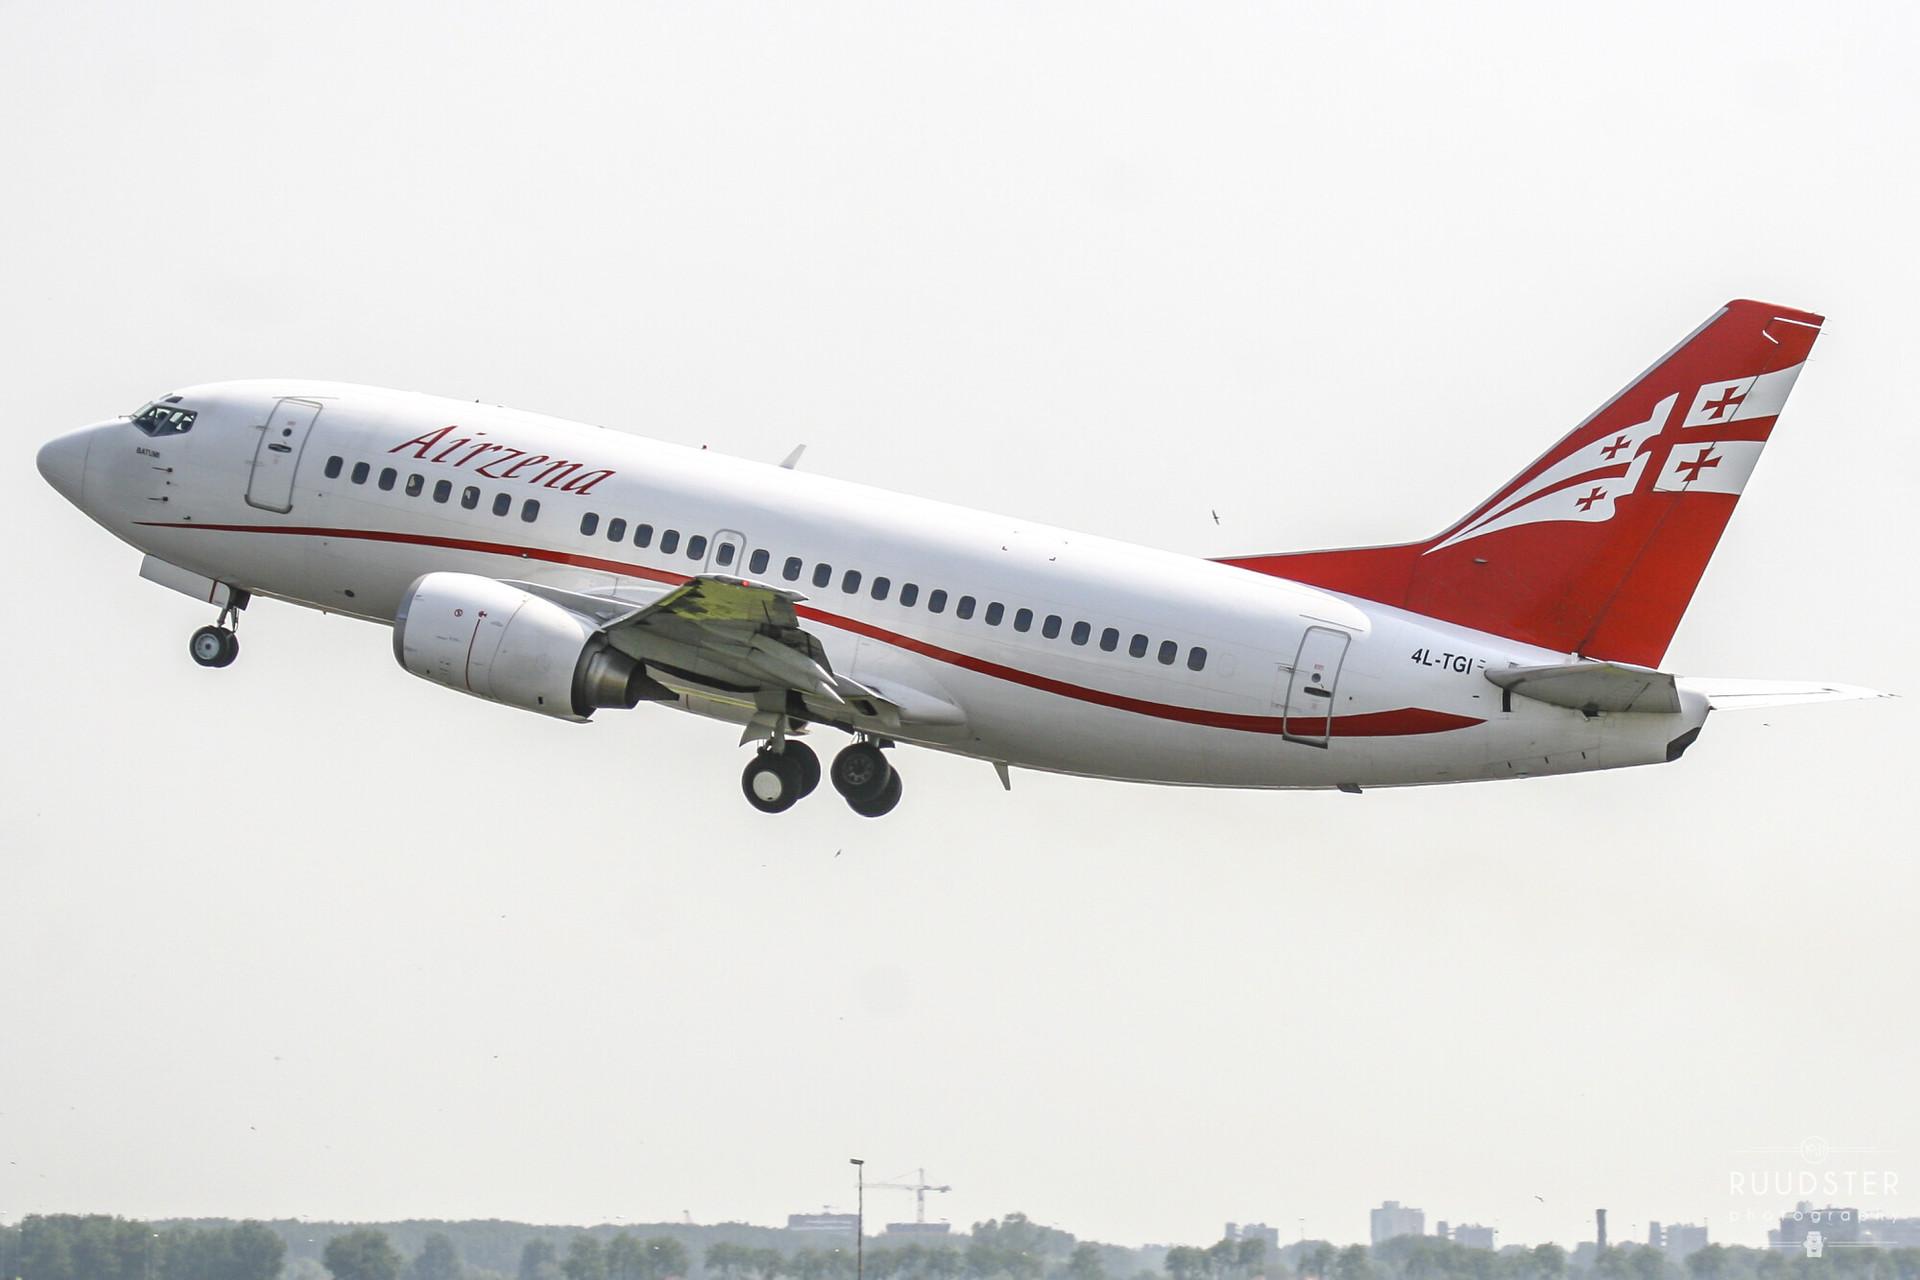 4L-TGI | Build: 1993 - Boeing 737-505